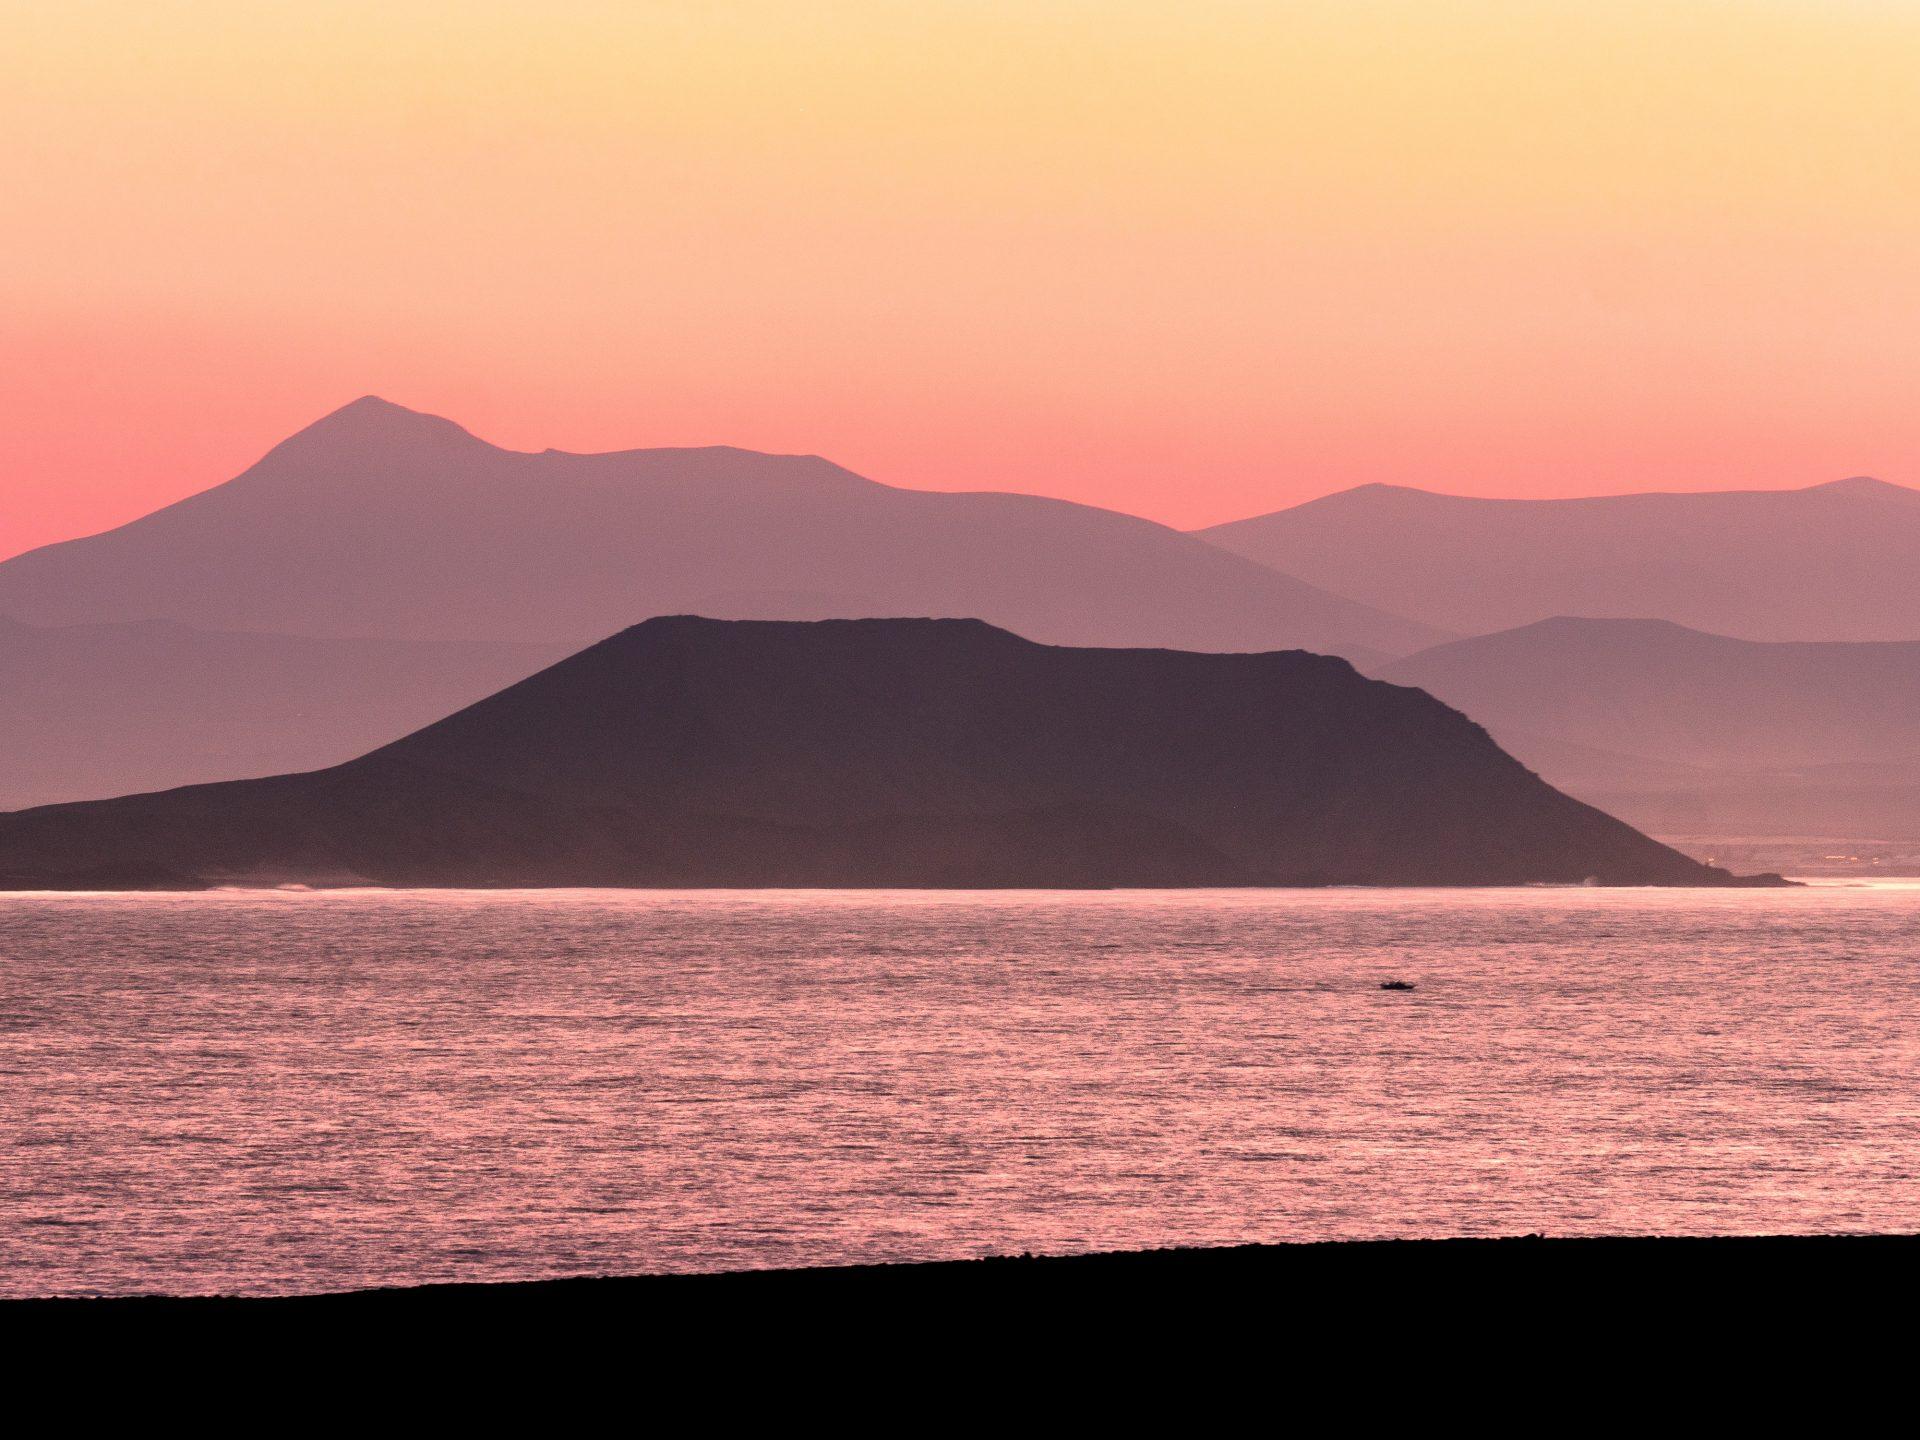 Lanzarote 51331 - Les globe blogueurs - blog voyage nature